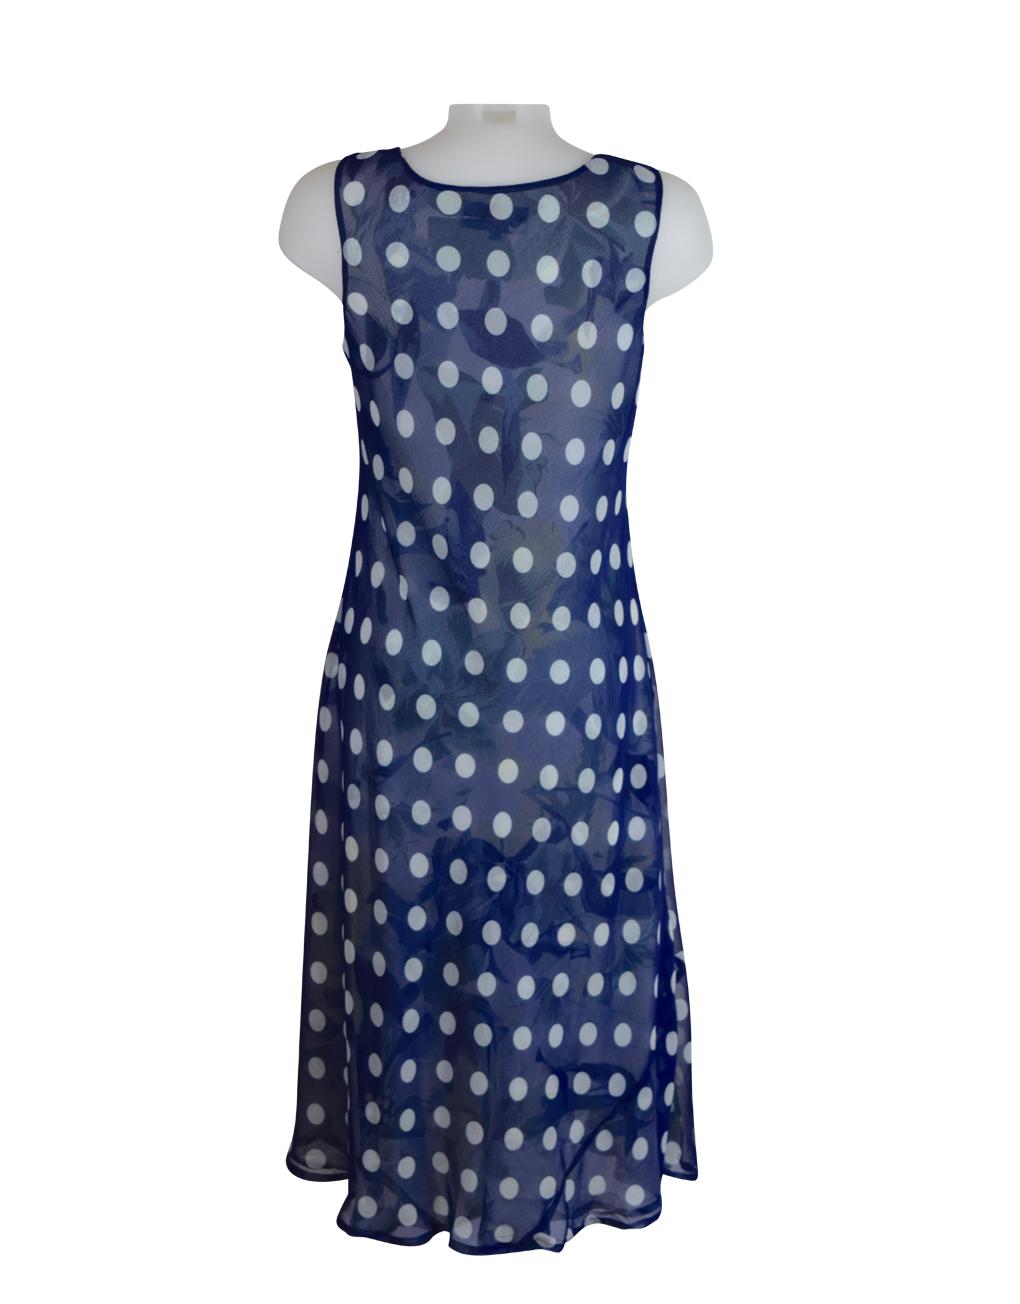 Paramour Reversible 2 In 1 Sleeveless Dress Navy & White Polka Dot / Floral L C